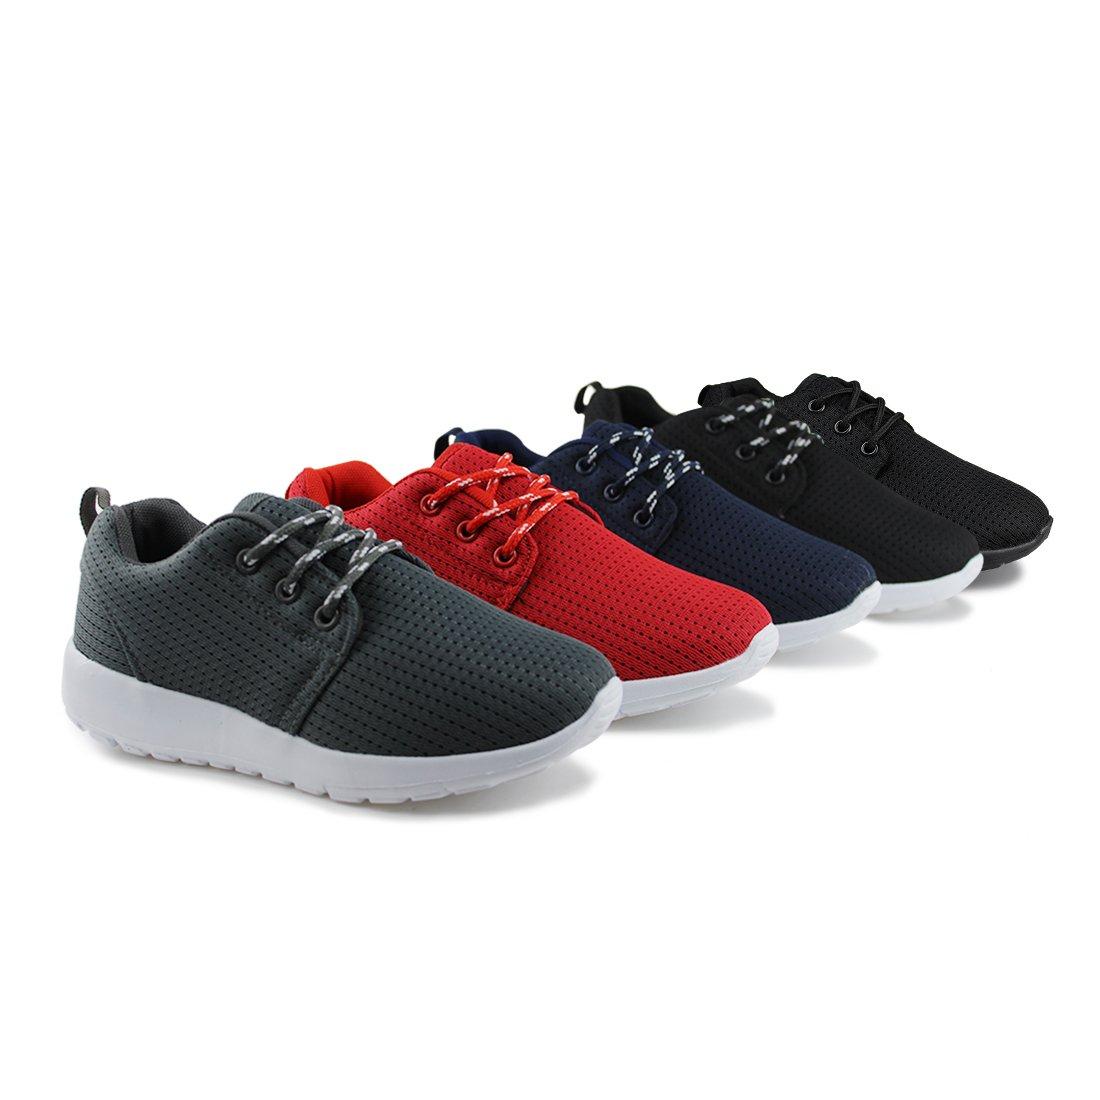 Toddler//Little Kid//Bid Kid Hawkwell Boys Girls Running Shoes Mesh Athletic Lightweight Easy Walking Sneakers